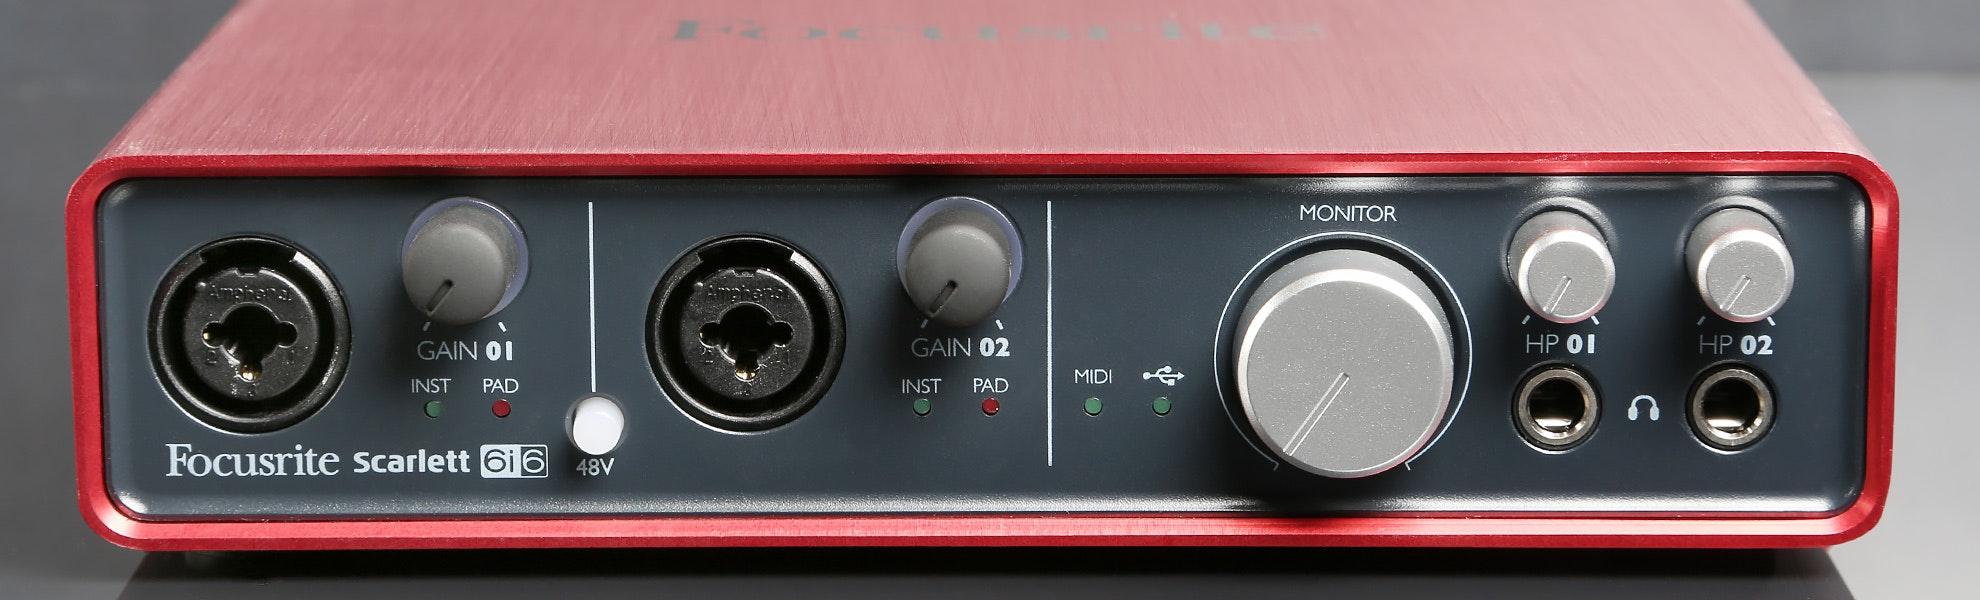 Focusrite 6i6 USB Audio Interface